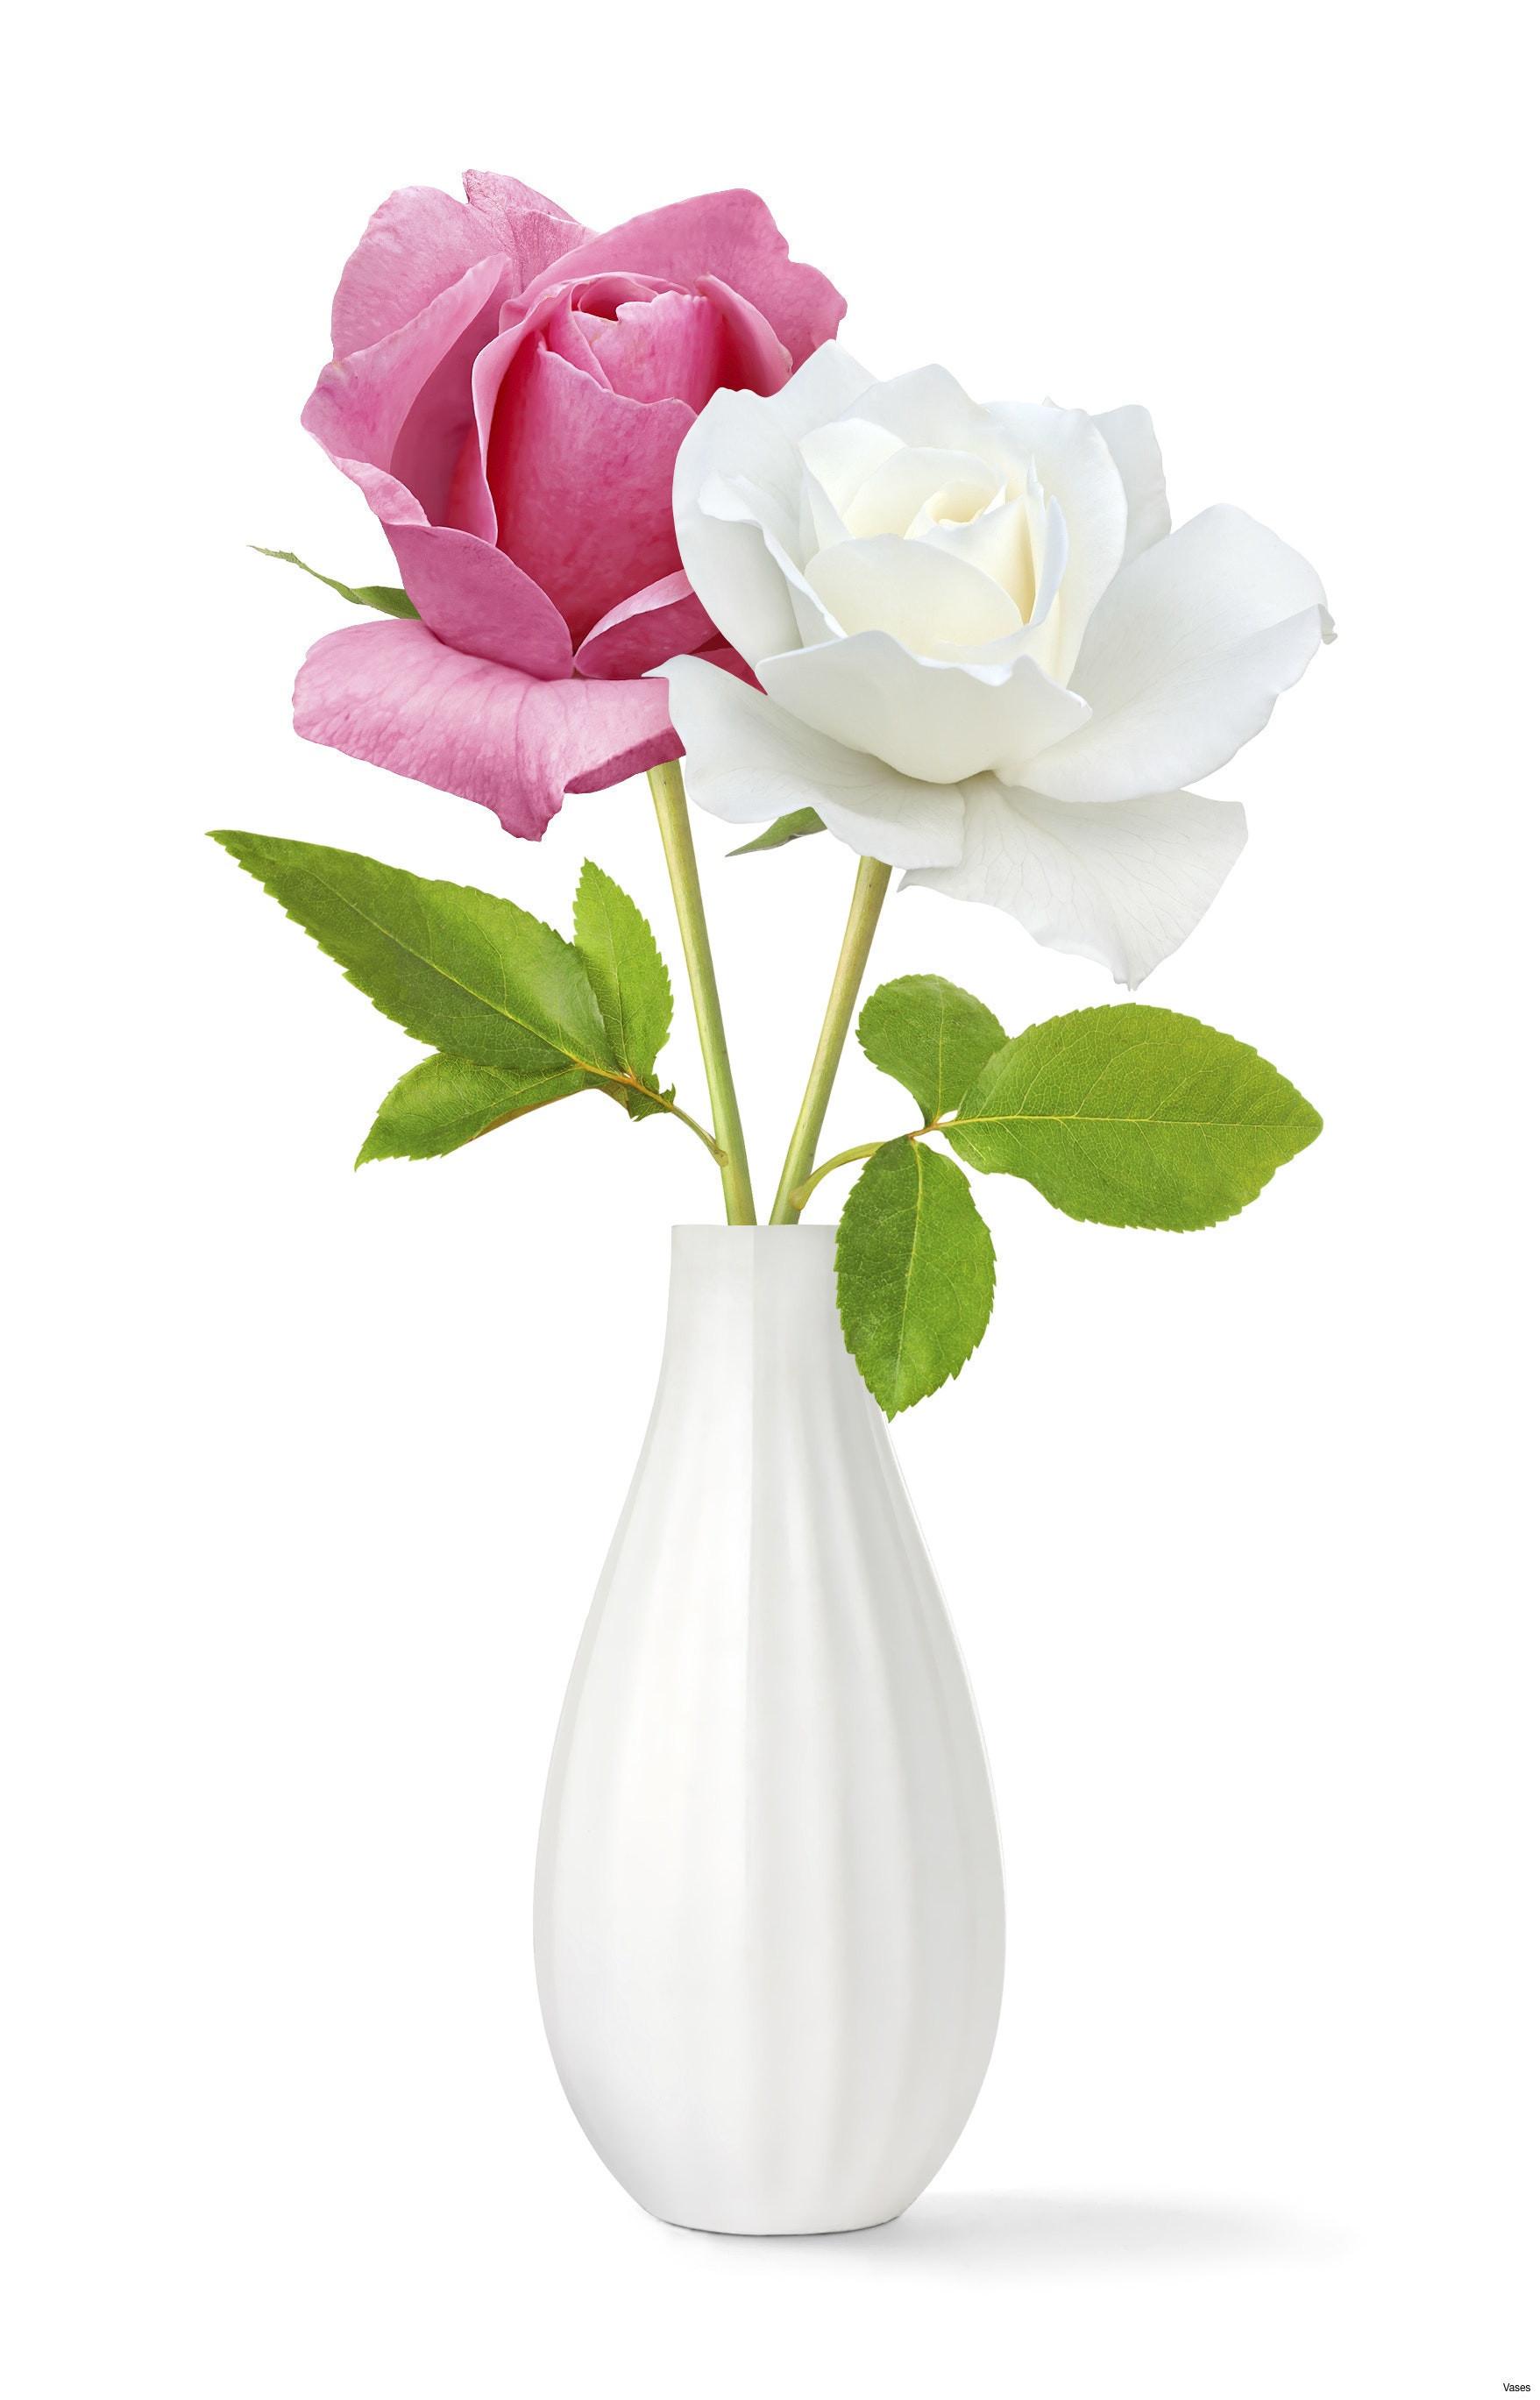 Roses Red In A Vase Singleh Vases Rose Single I 0d Scheme Single Scheme Rose